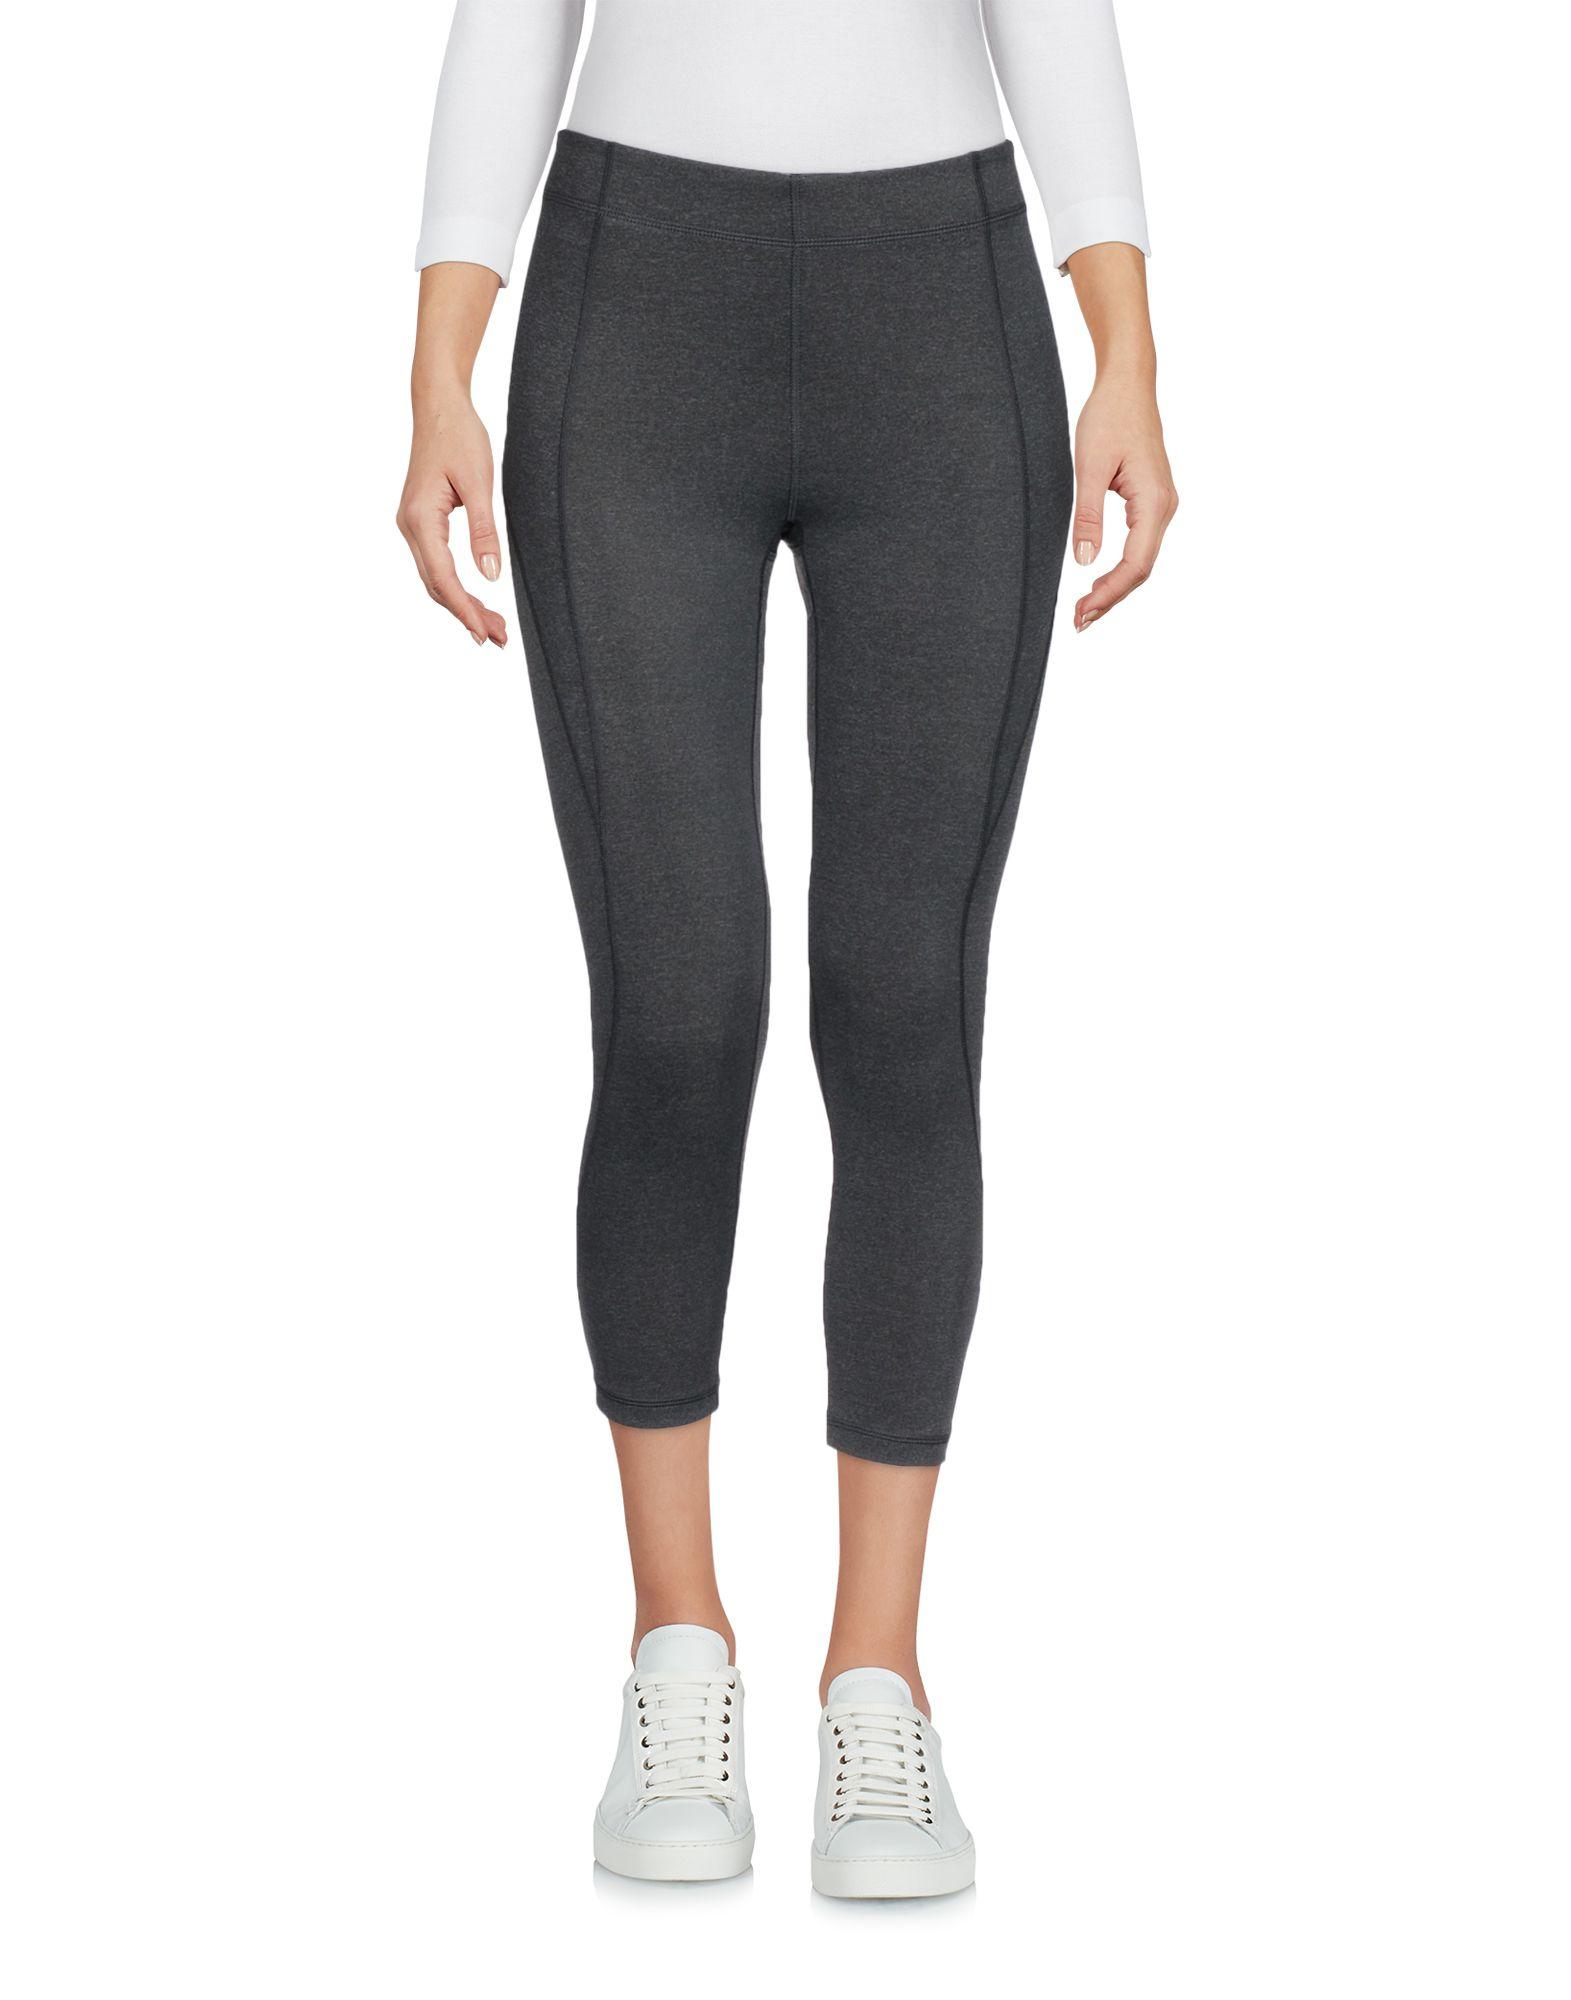 Leggings in Grey